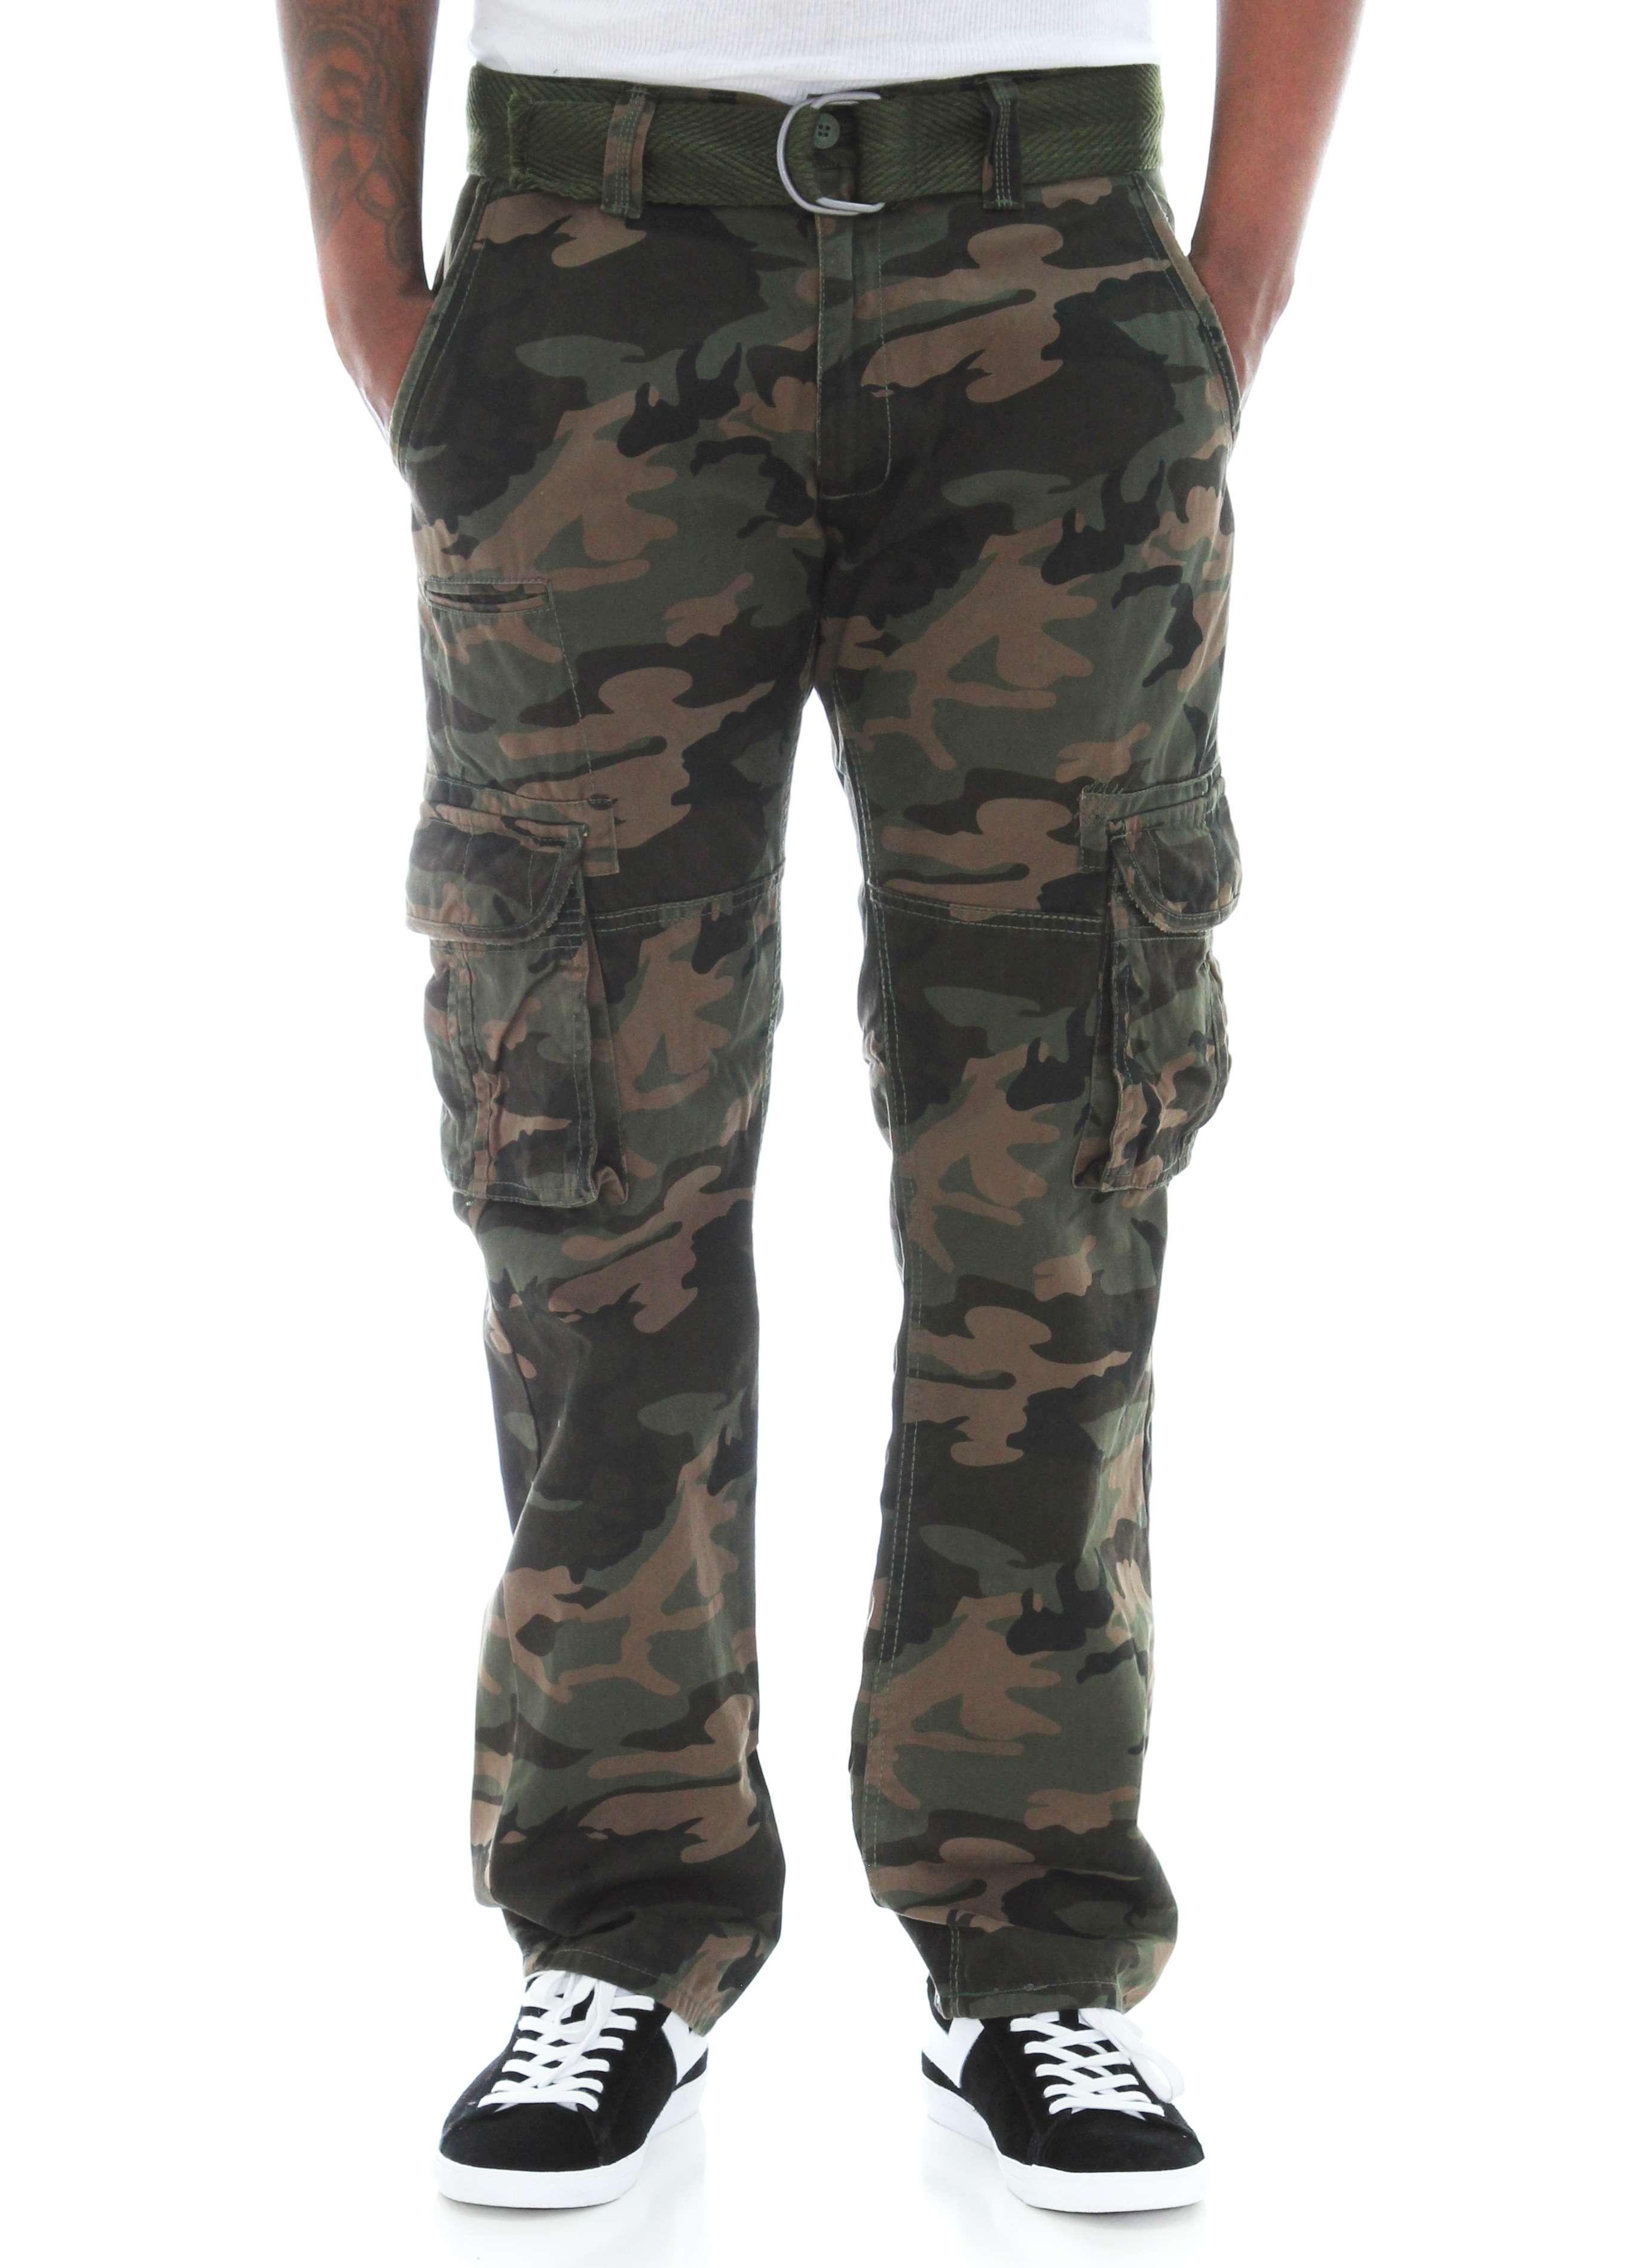 Camo Cargo Pants With Jordans | www.imgkid.com - The Image ...